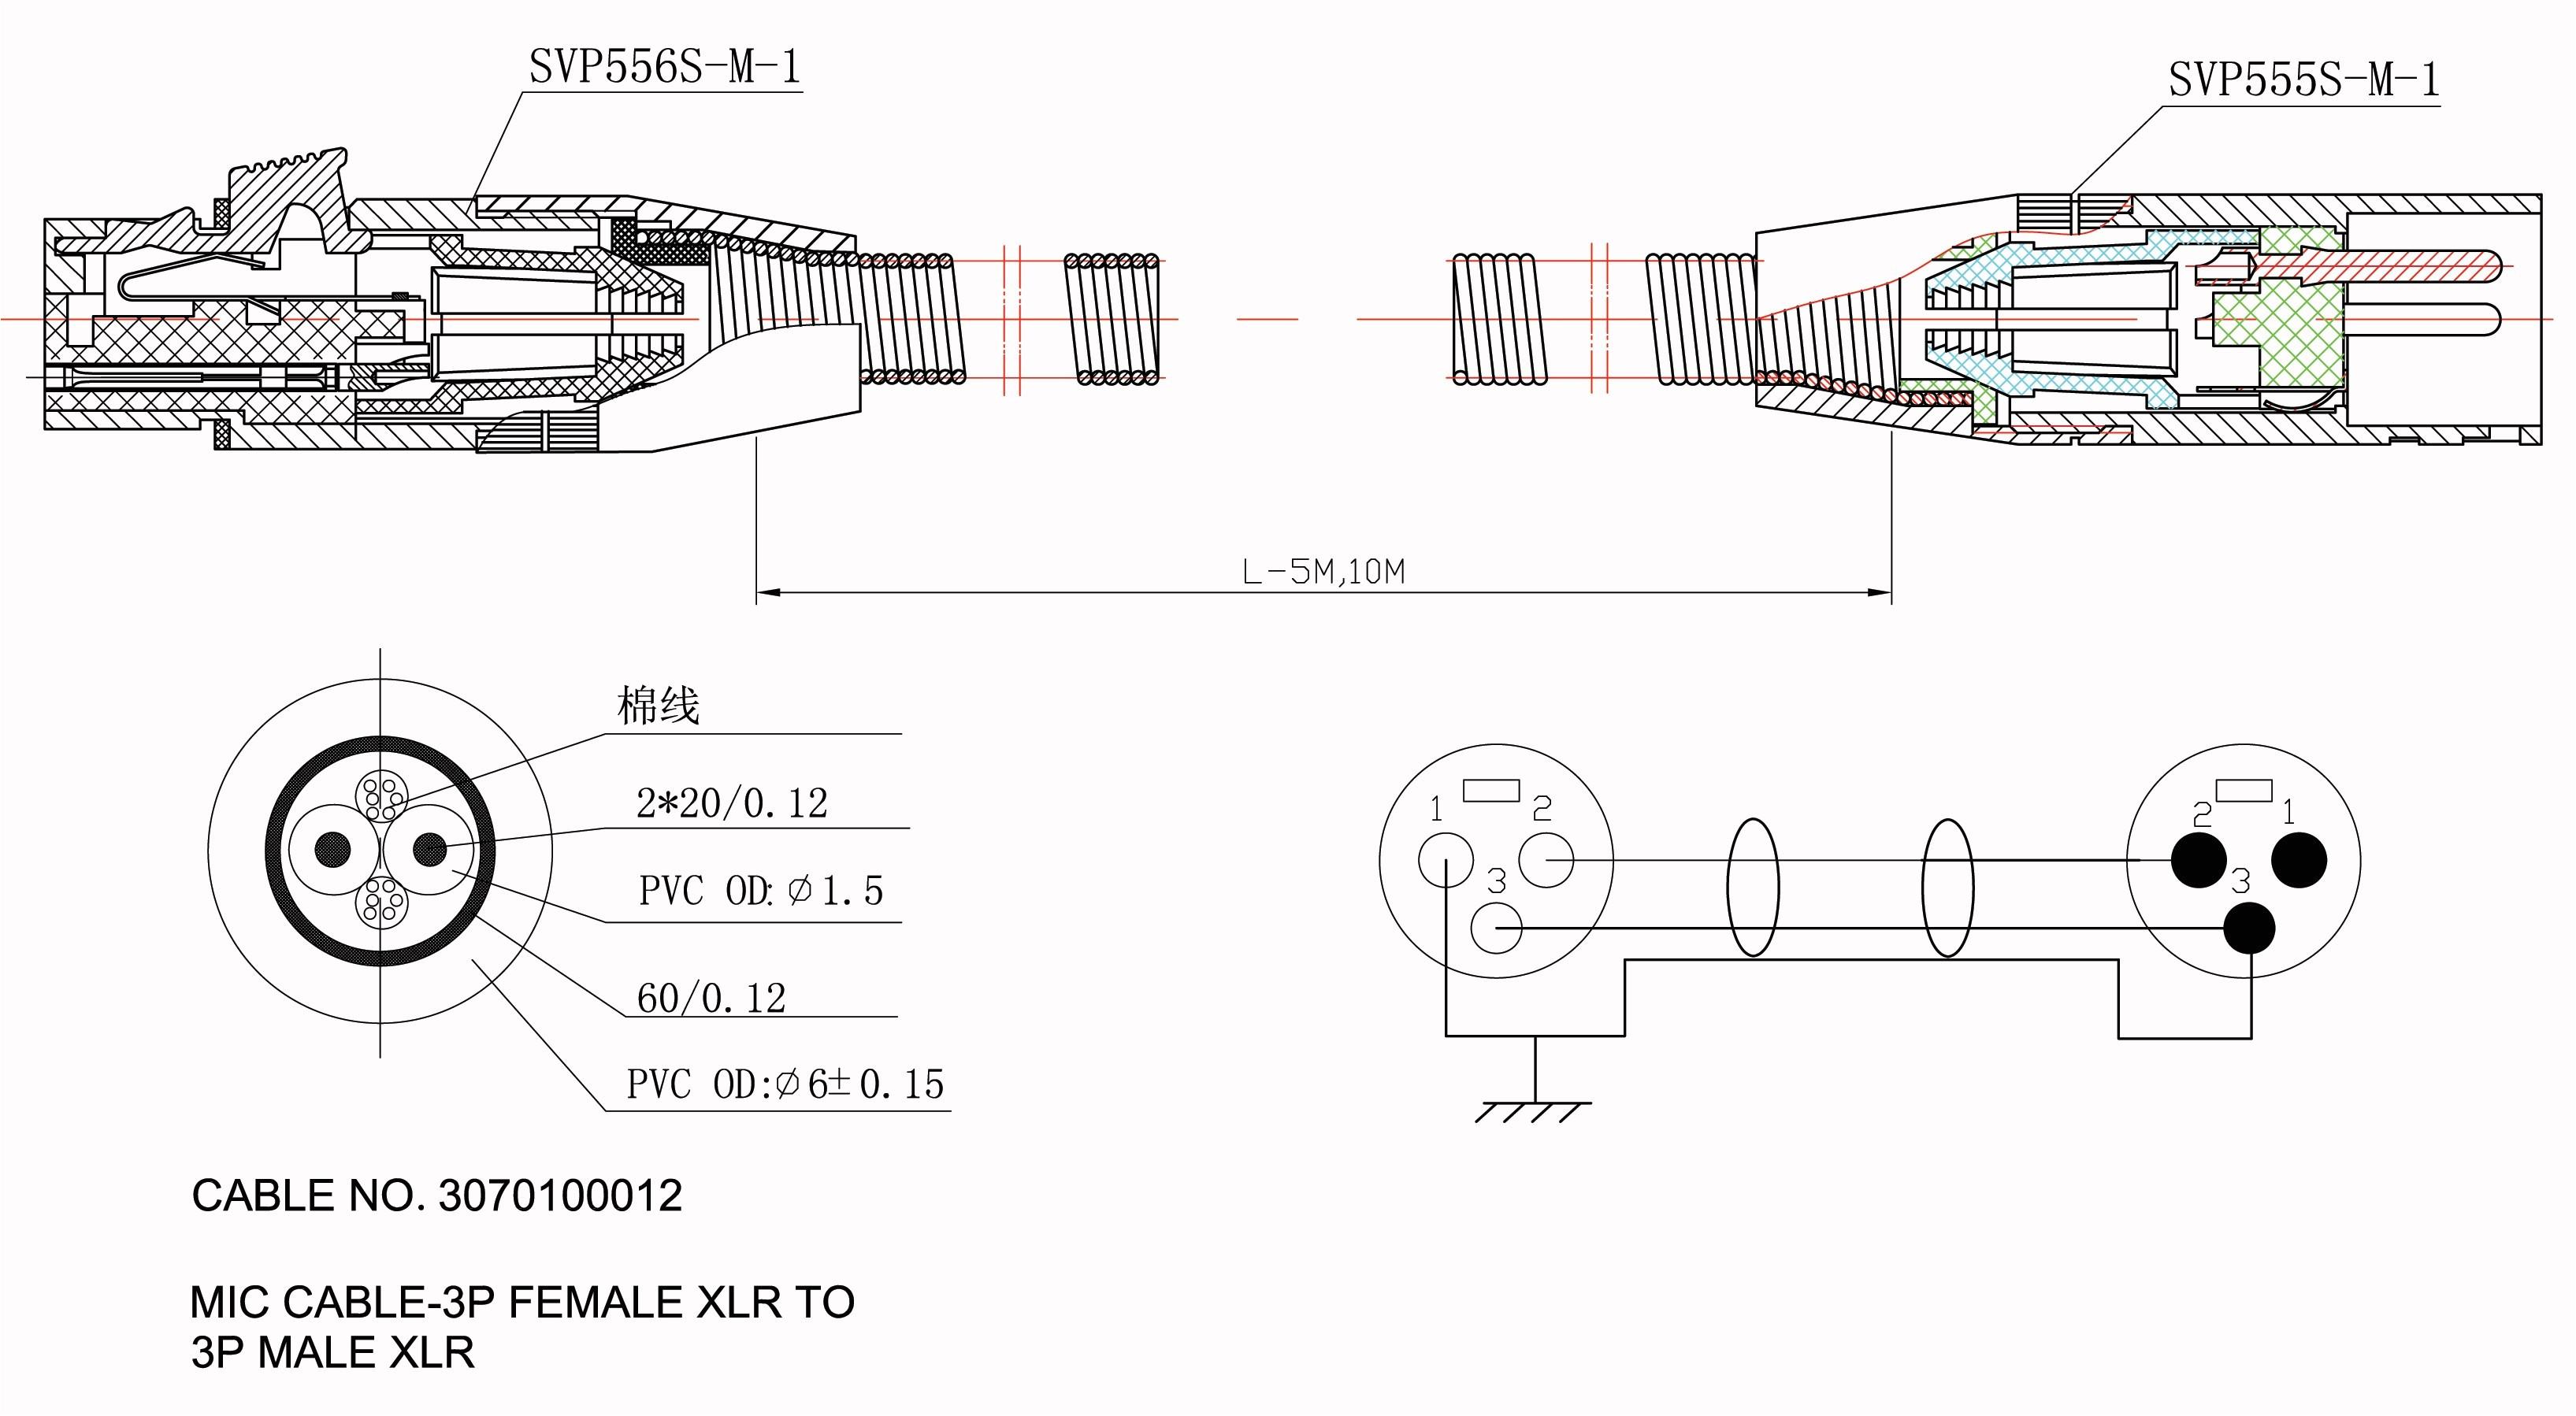 basic 12 volt boat wiring diagram beautiful boat amplifier wiring diagram simple boat plug wiring wire